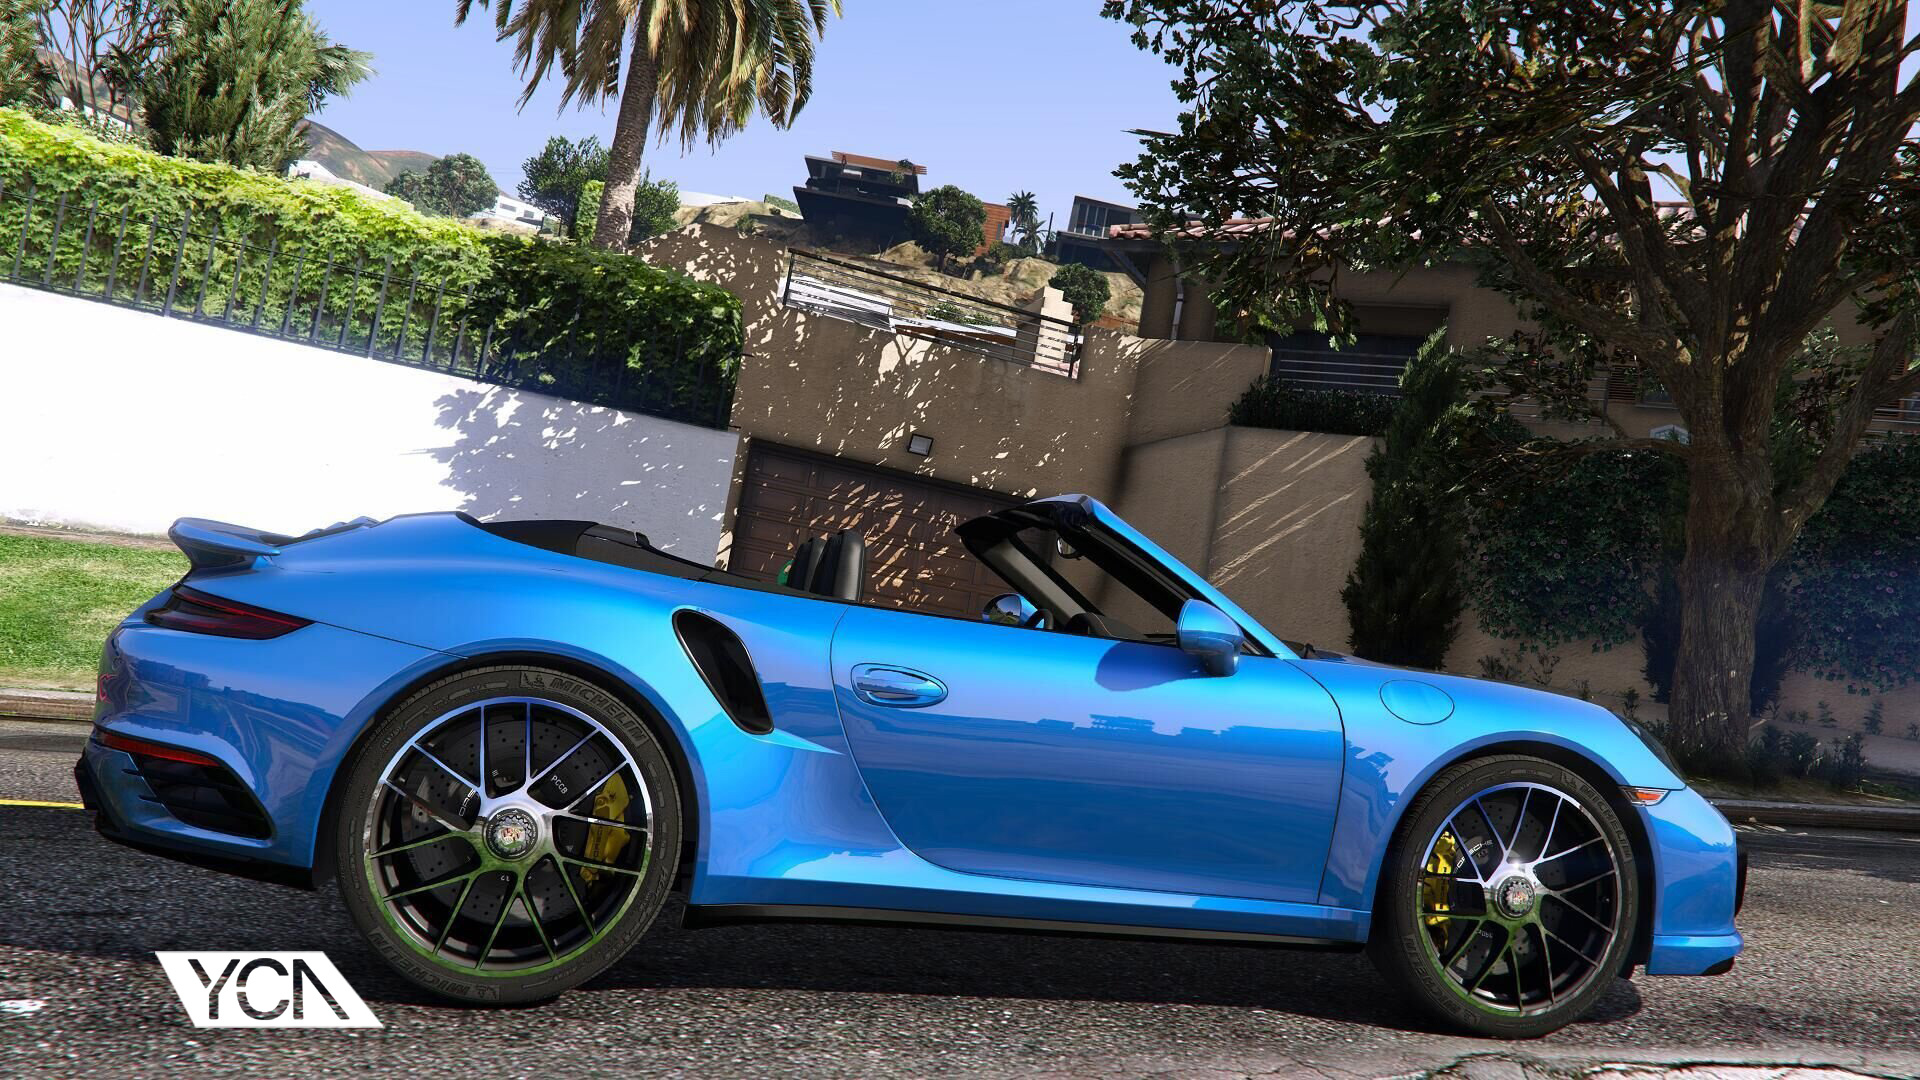 2016 porsche 911 turbo s cabriolet 991 2 add on wipers gta5. Black Bedroom Furniture Sets. Home Design Ideas